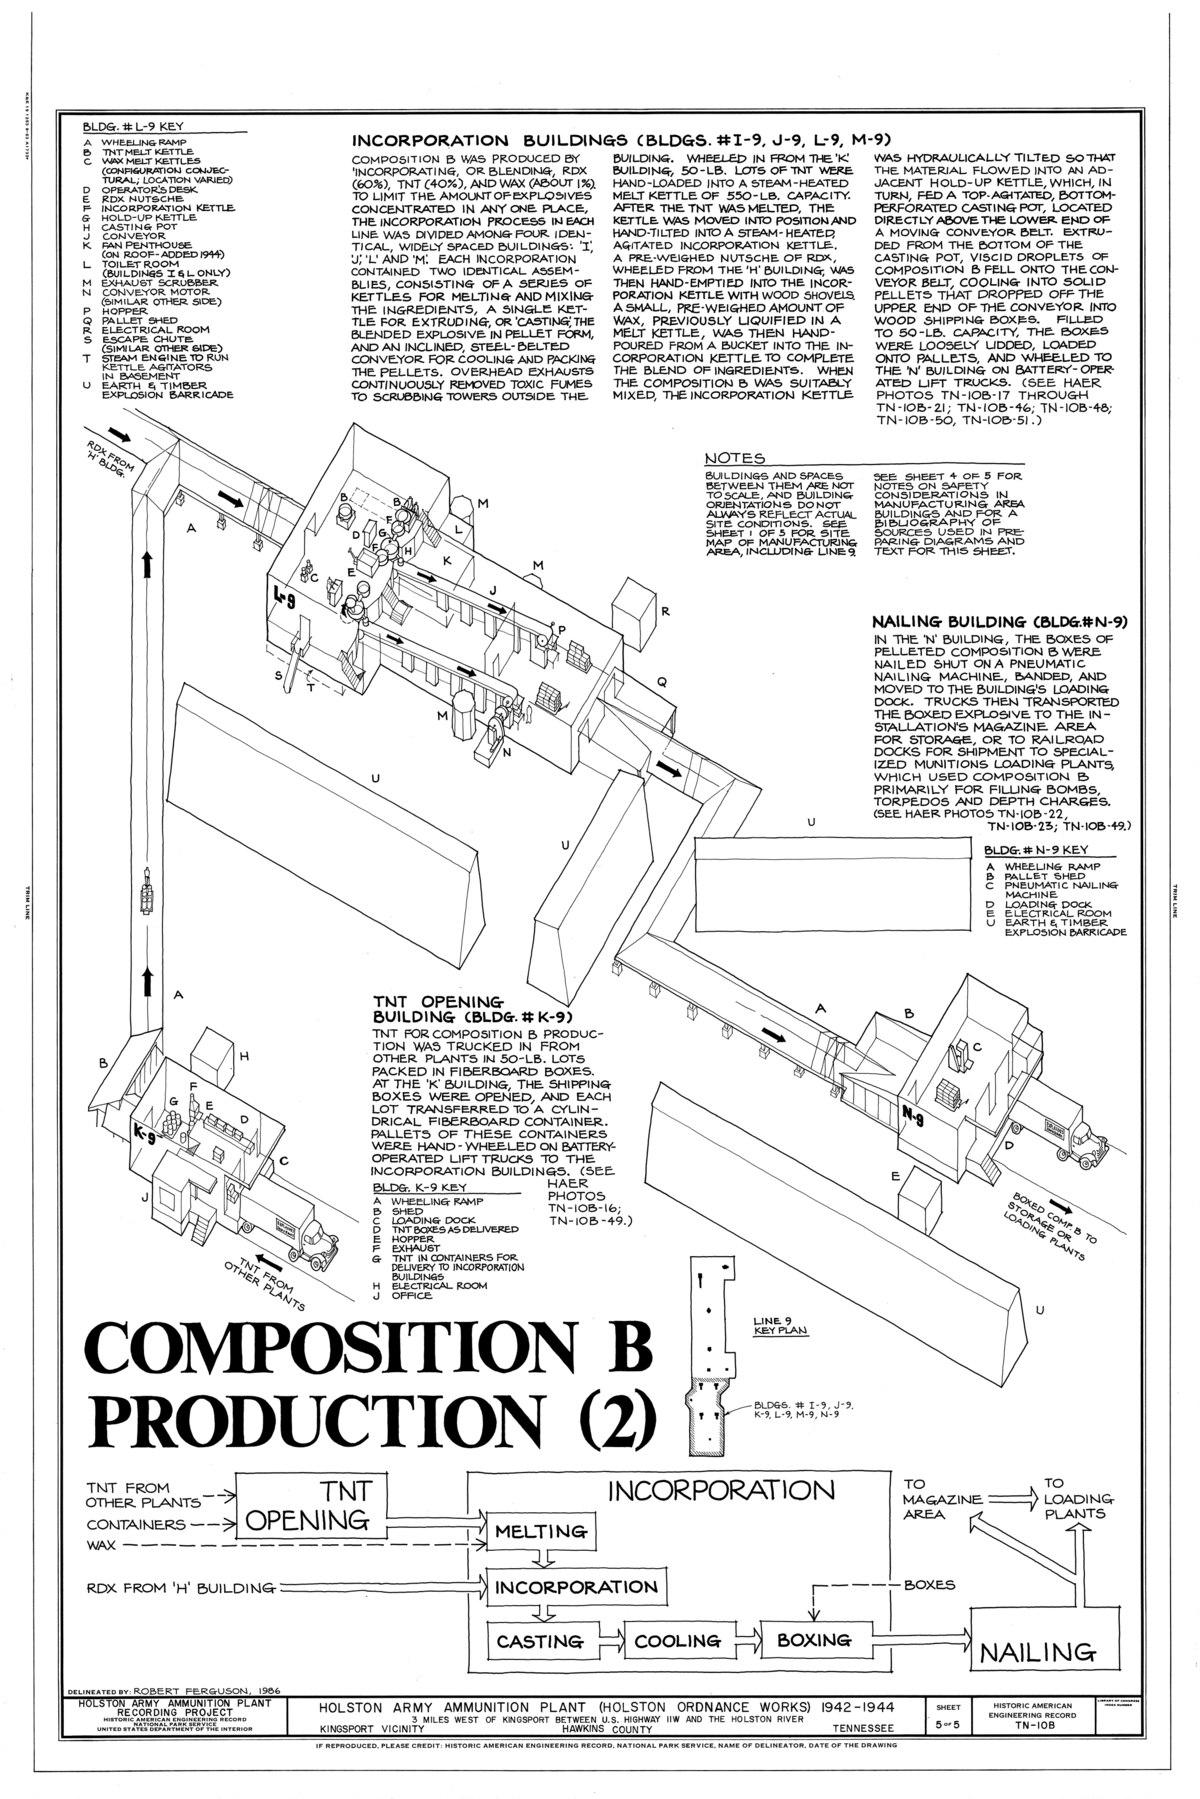 File Composition B Production 2